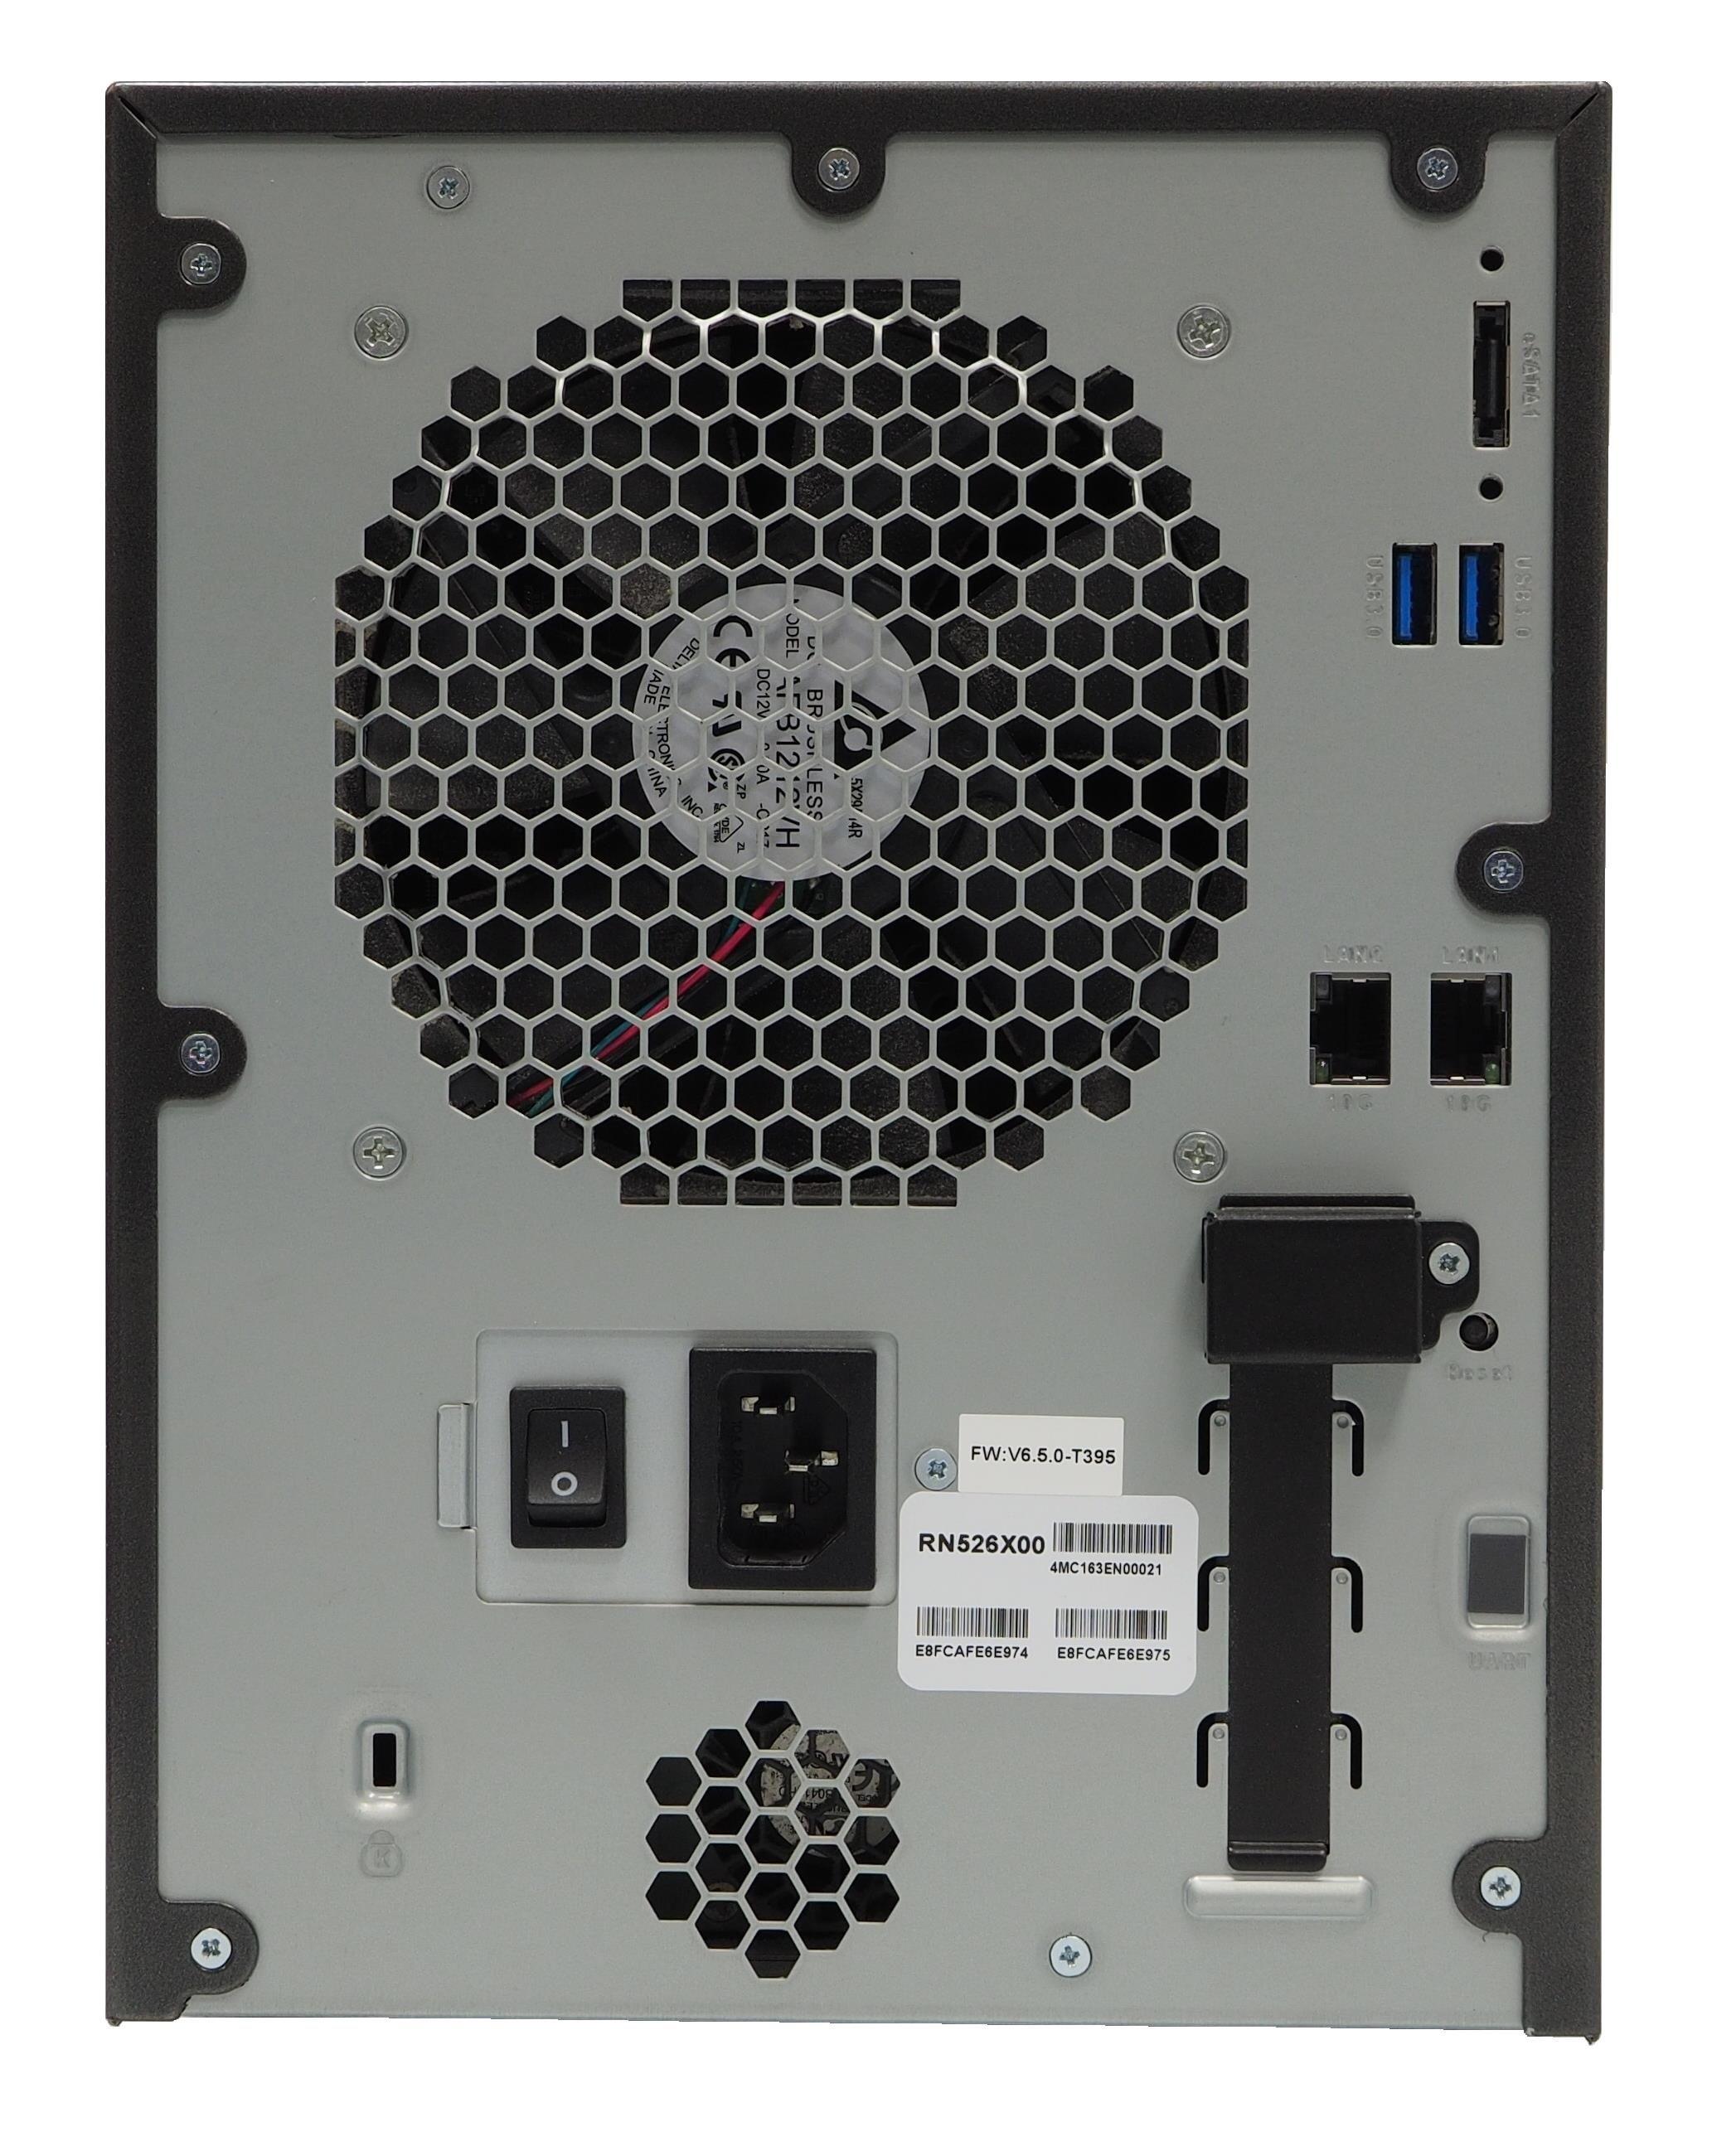 Netgear ReadyNAS RN526XE4 (6 x 4TB) Network Attached Storage